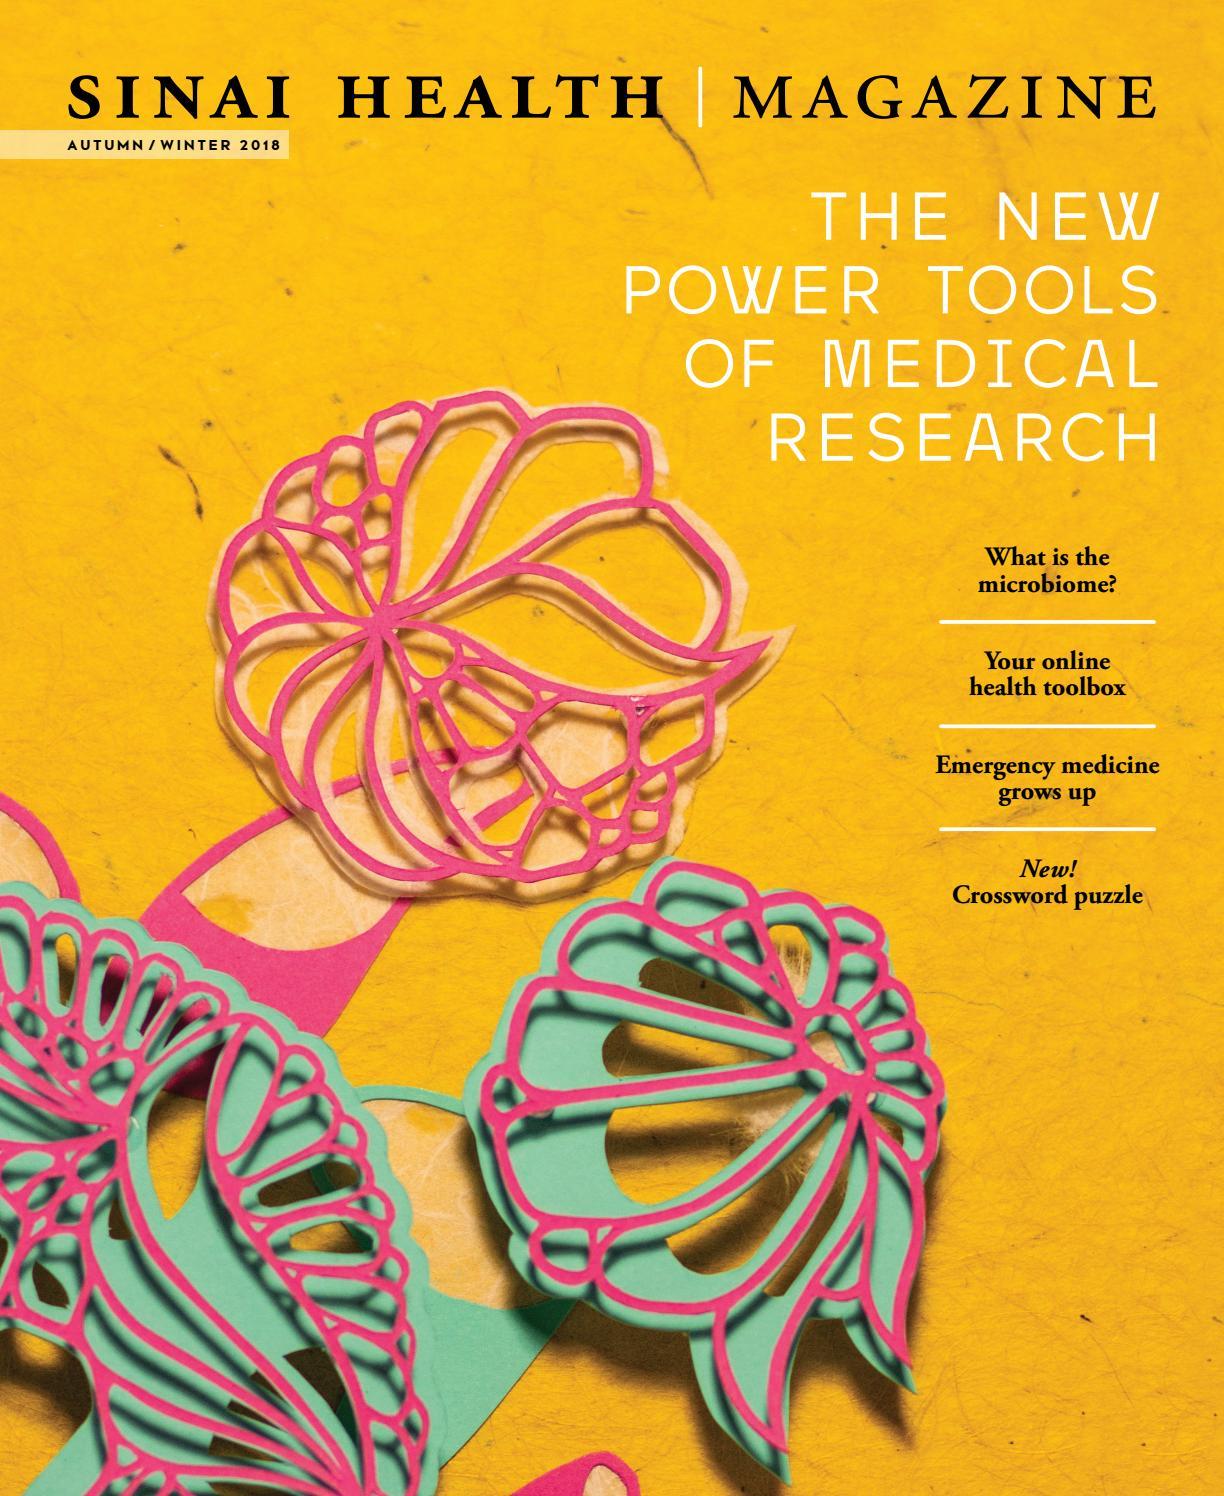 Sinai Health Magazine Fall/Winter 2018 by Sinai Health Foundation